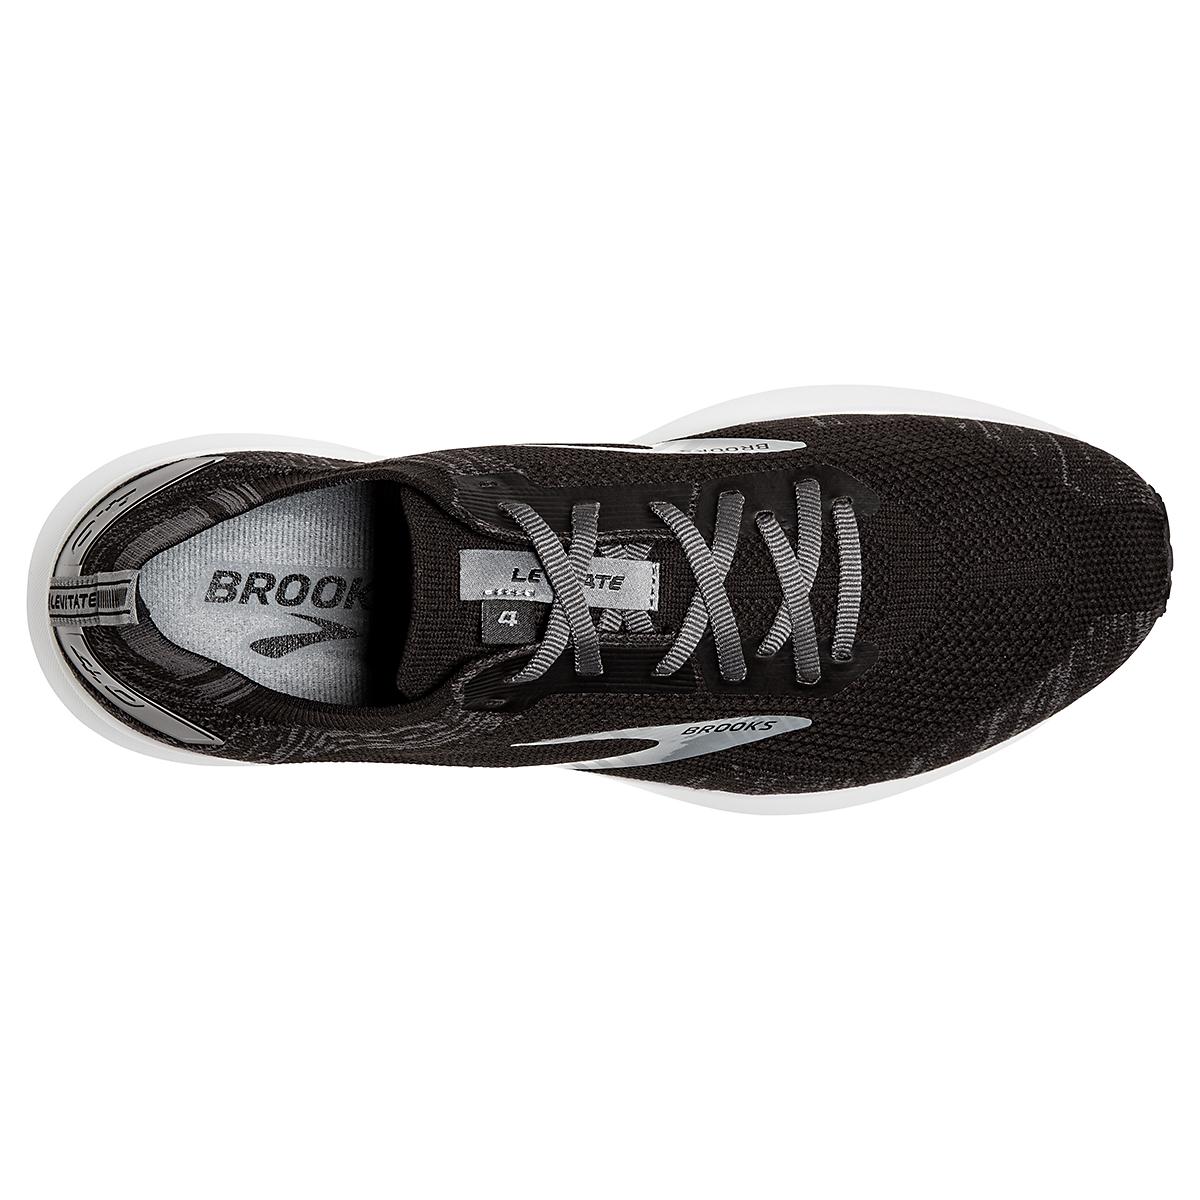 Women's Brooks Levitate 4 Running Shoe - Color: Black/Blackened Pearl/White - Size: 5.5 - Width: Regular, Black/Blackened Pearl/White, large, image 3